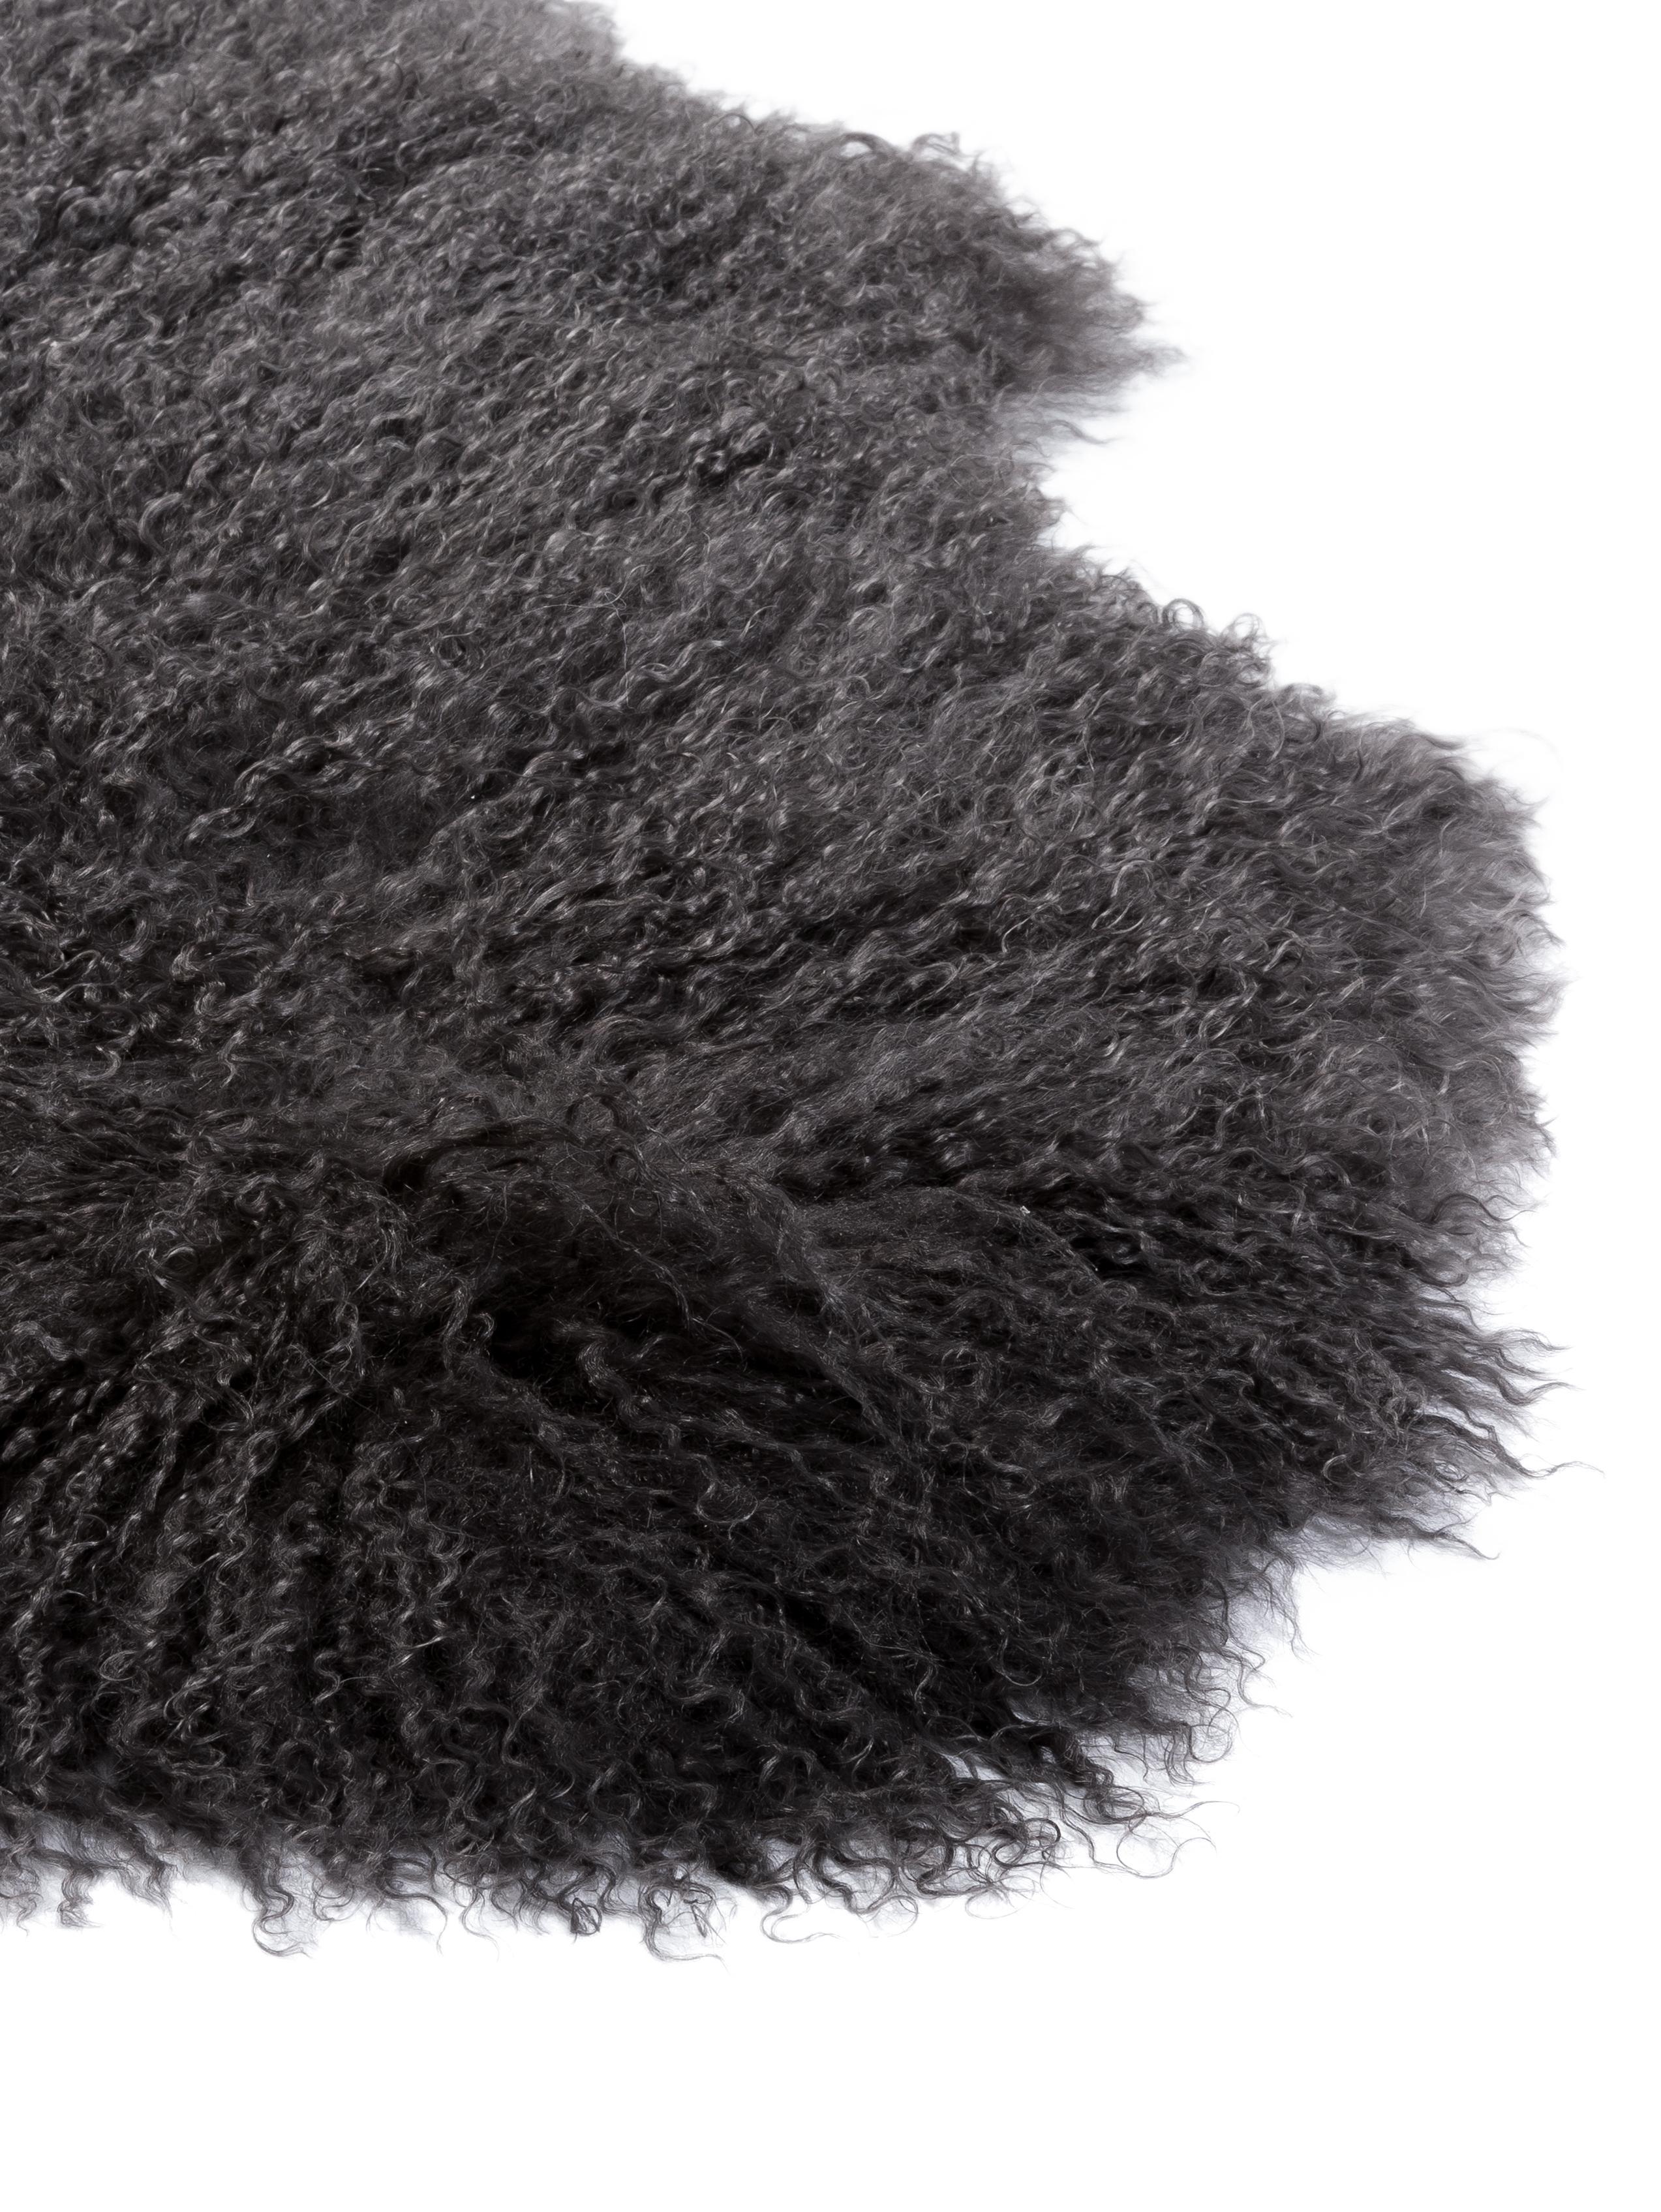 Langhaar-Lammfell-Teppich Ella, gelockt, Vorderseite: Mongolisches Lammfell, Rückseite: Leder, Dunkelgrau, 50 x 160 cm